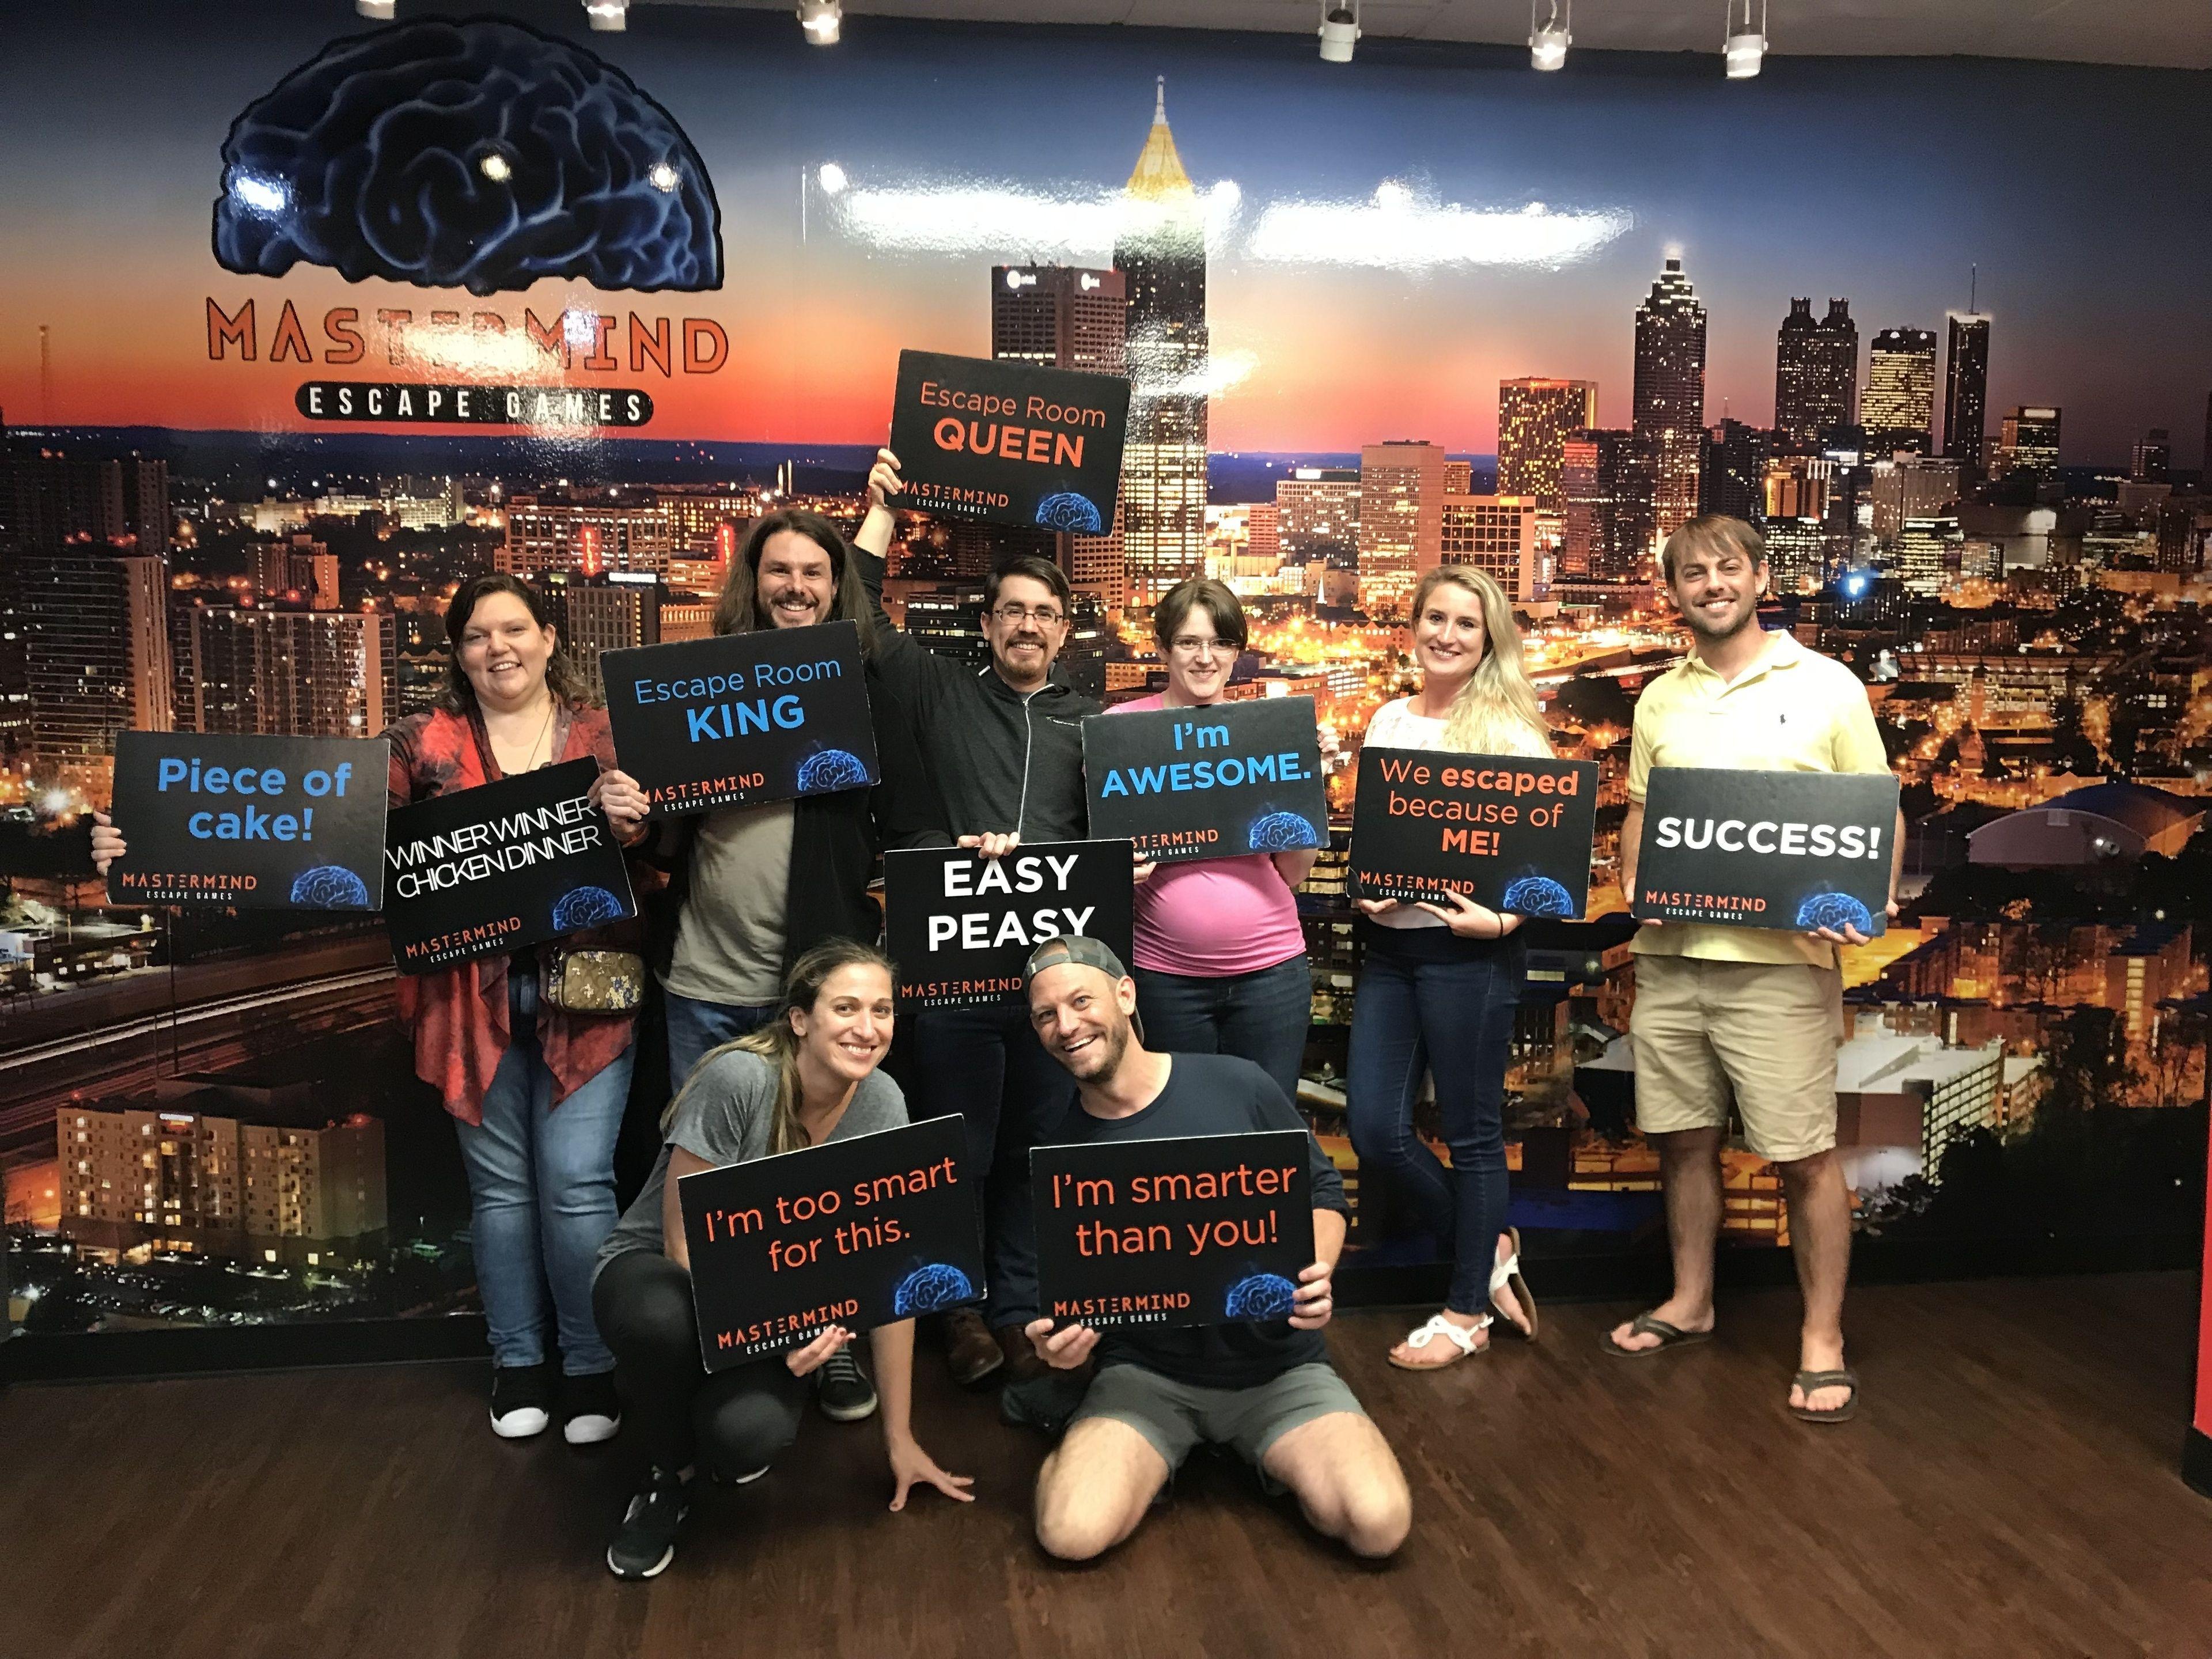 Jacksonville Bank Heist Escape Room